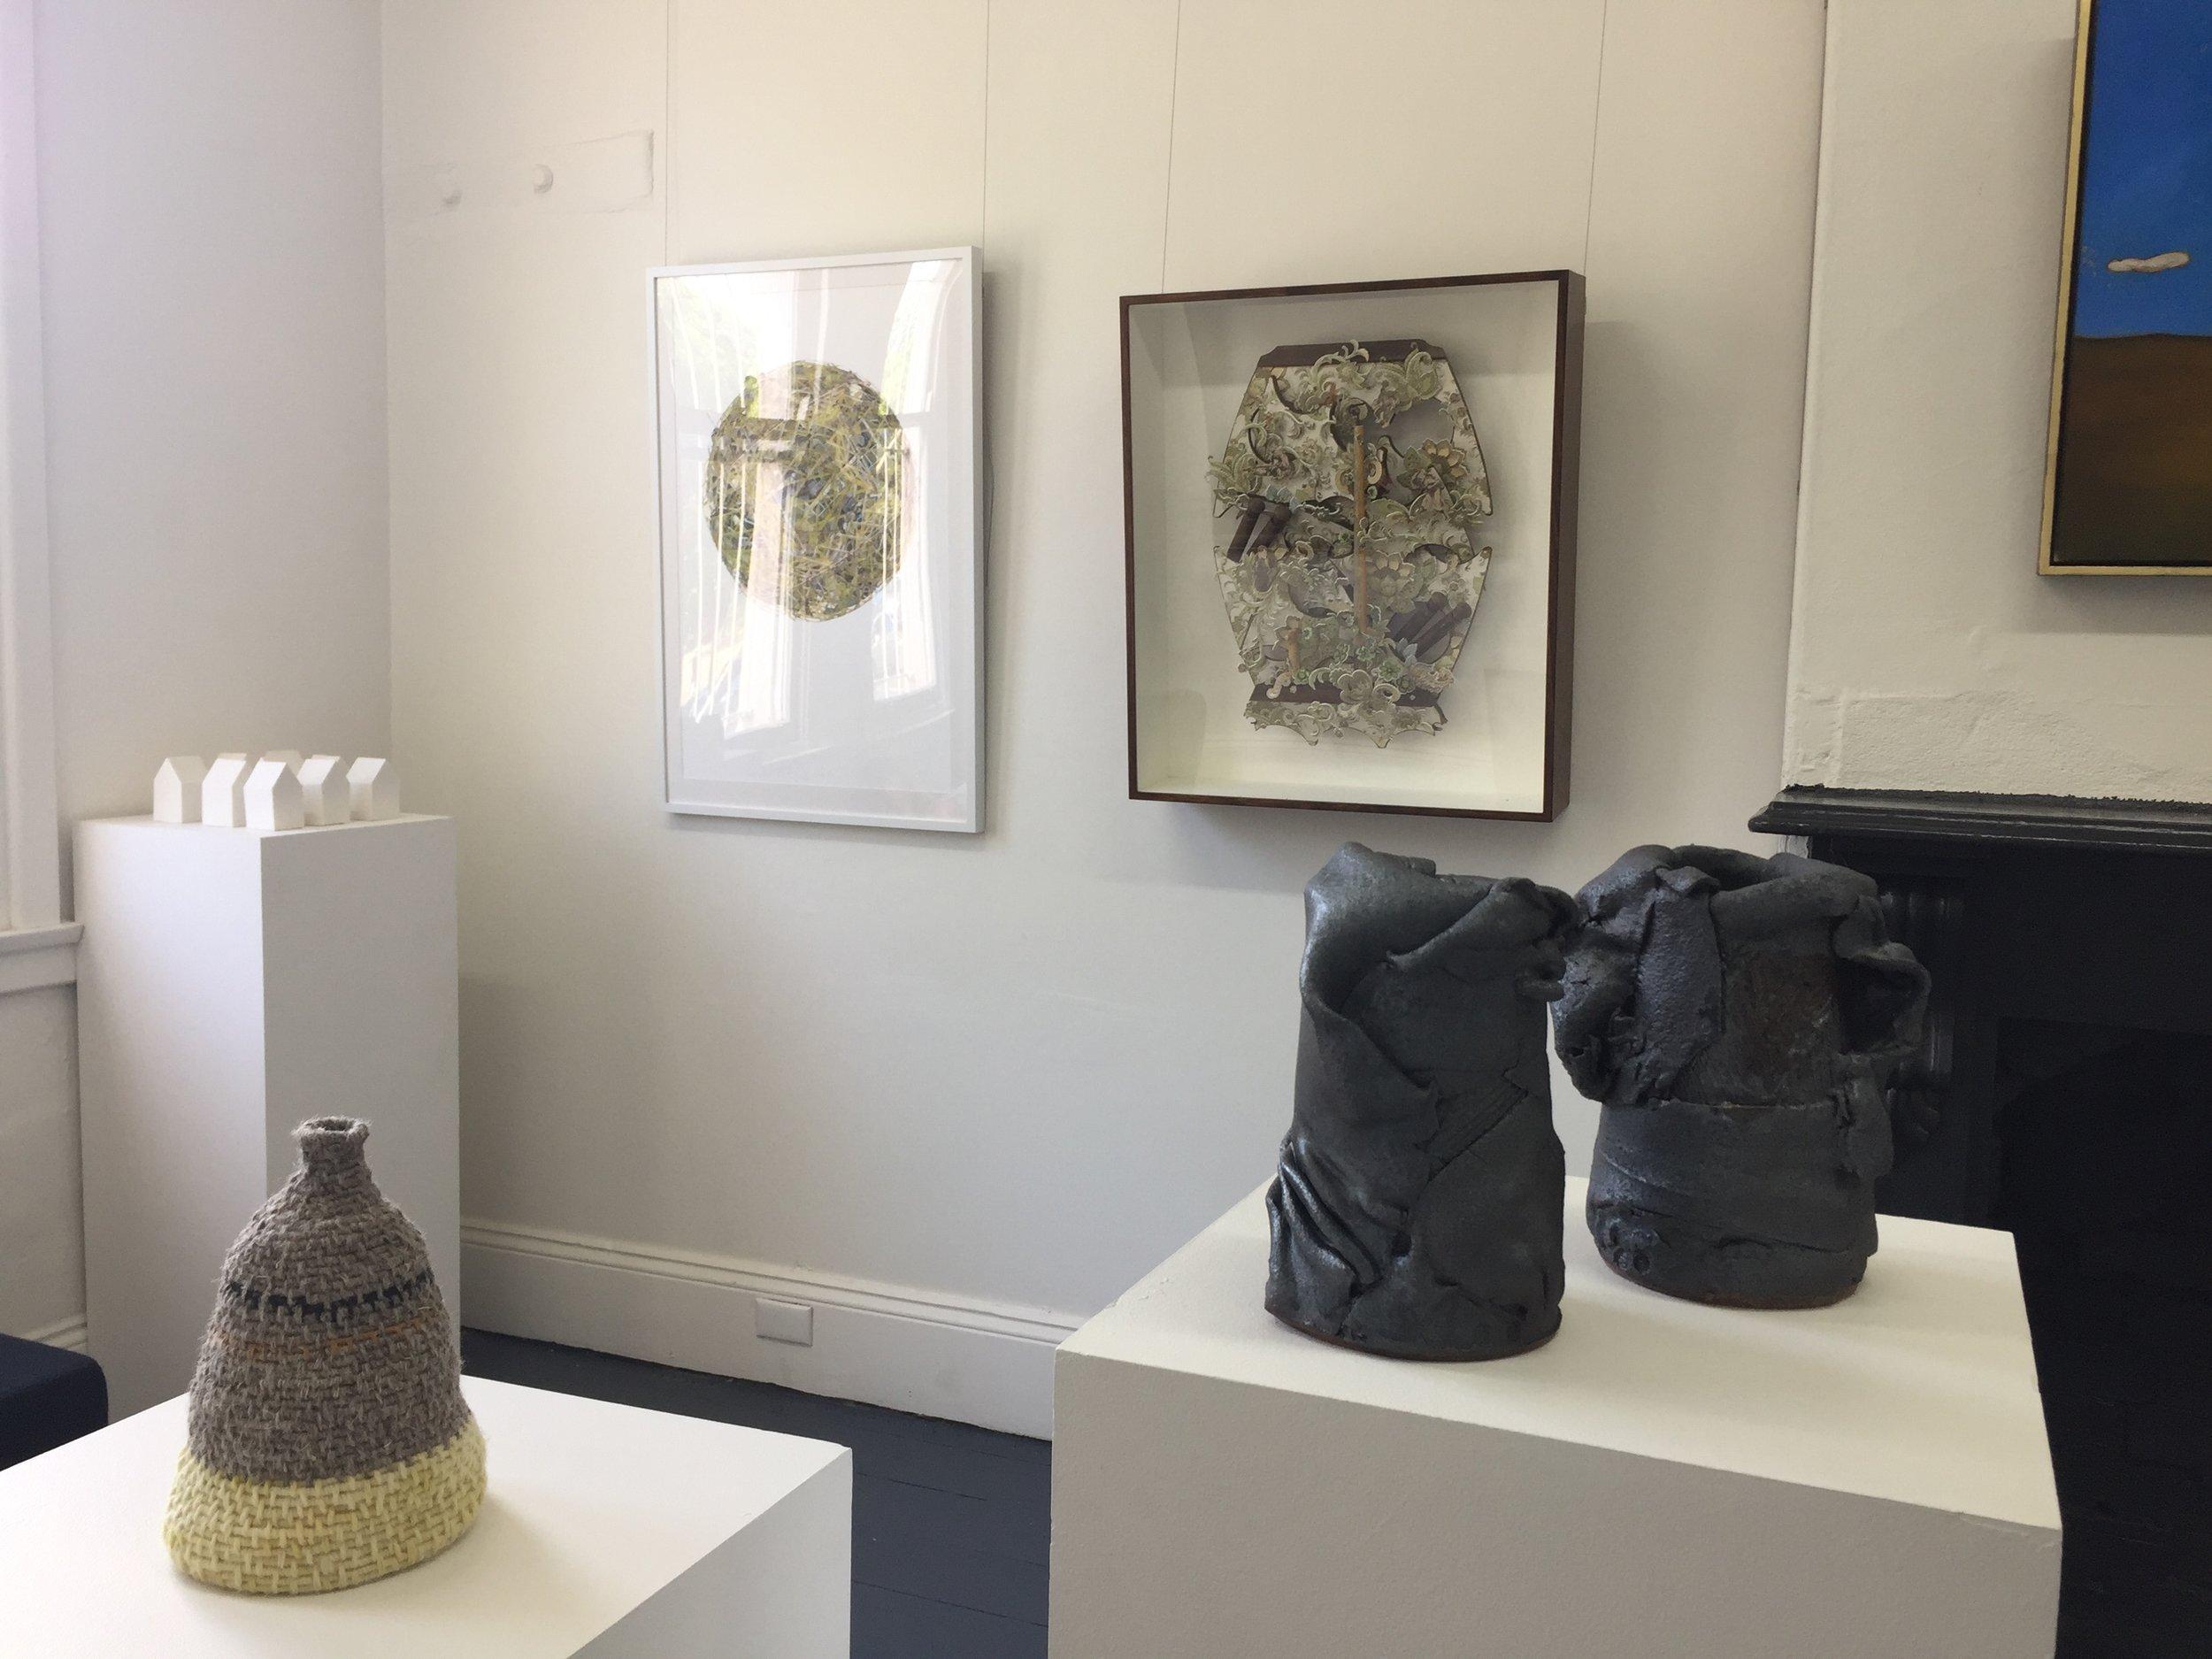 install view on wall Alison Smith, Dominic Kavanagh, porcelain houses Nadia Aurisch, vessel Melissa Bull, ceramic vases John Heaney